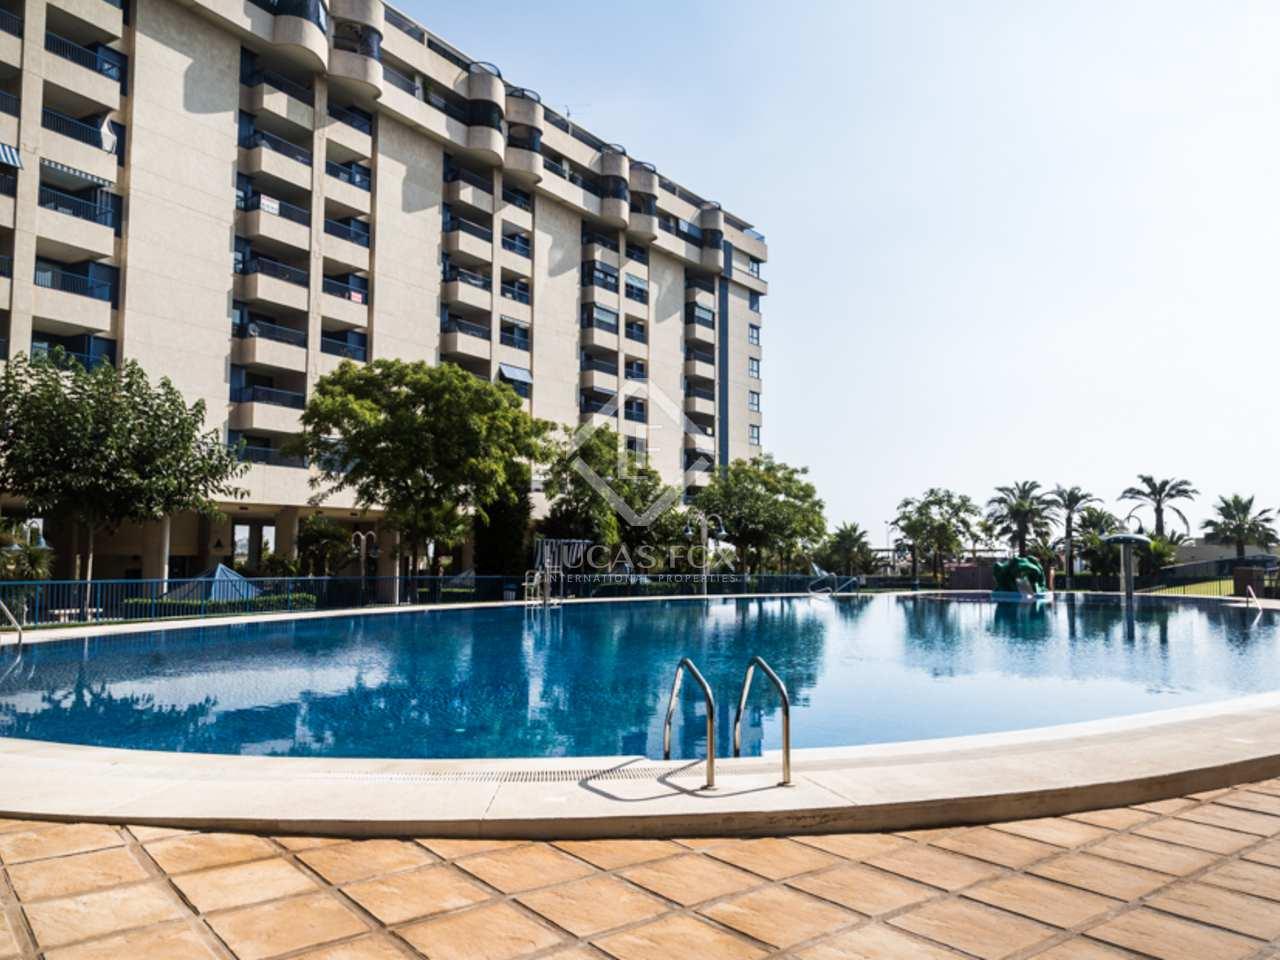 Piso de 97m con terraza y piscina en venta en patacona for Piscina patacona